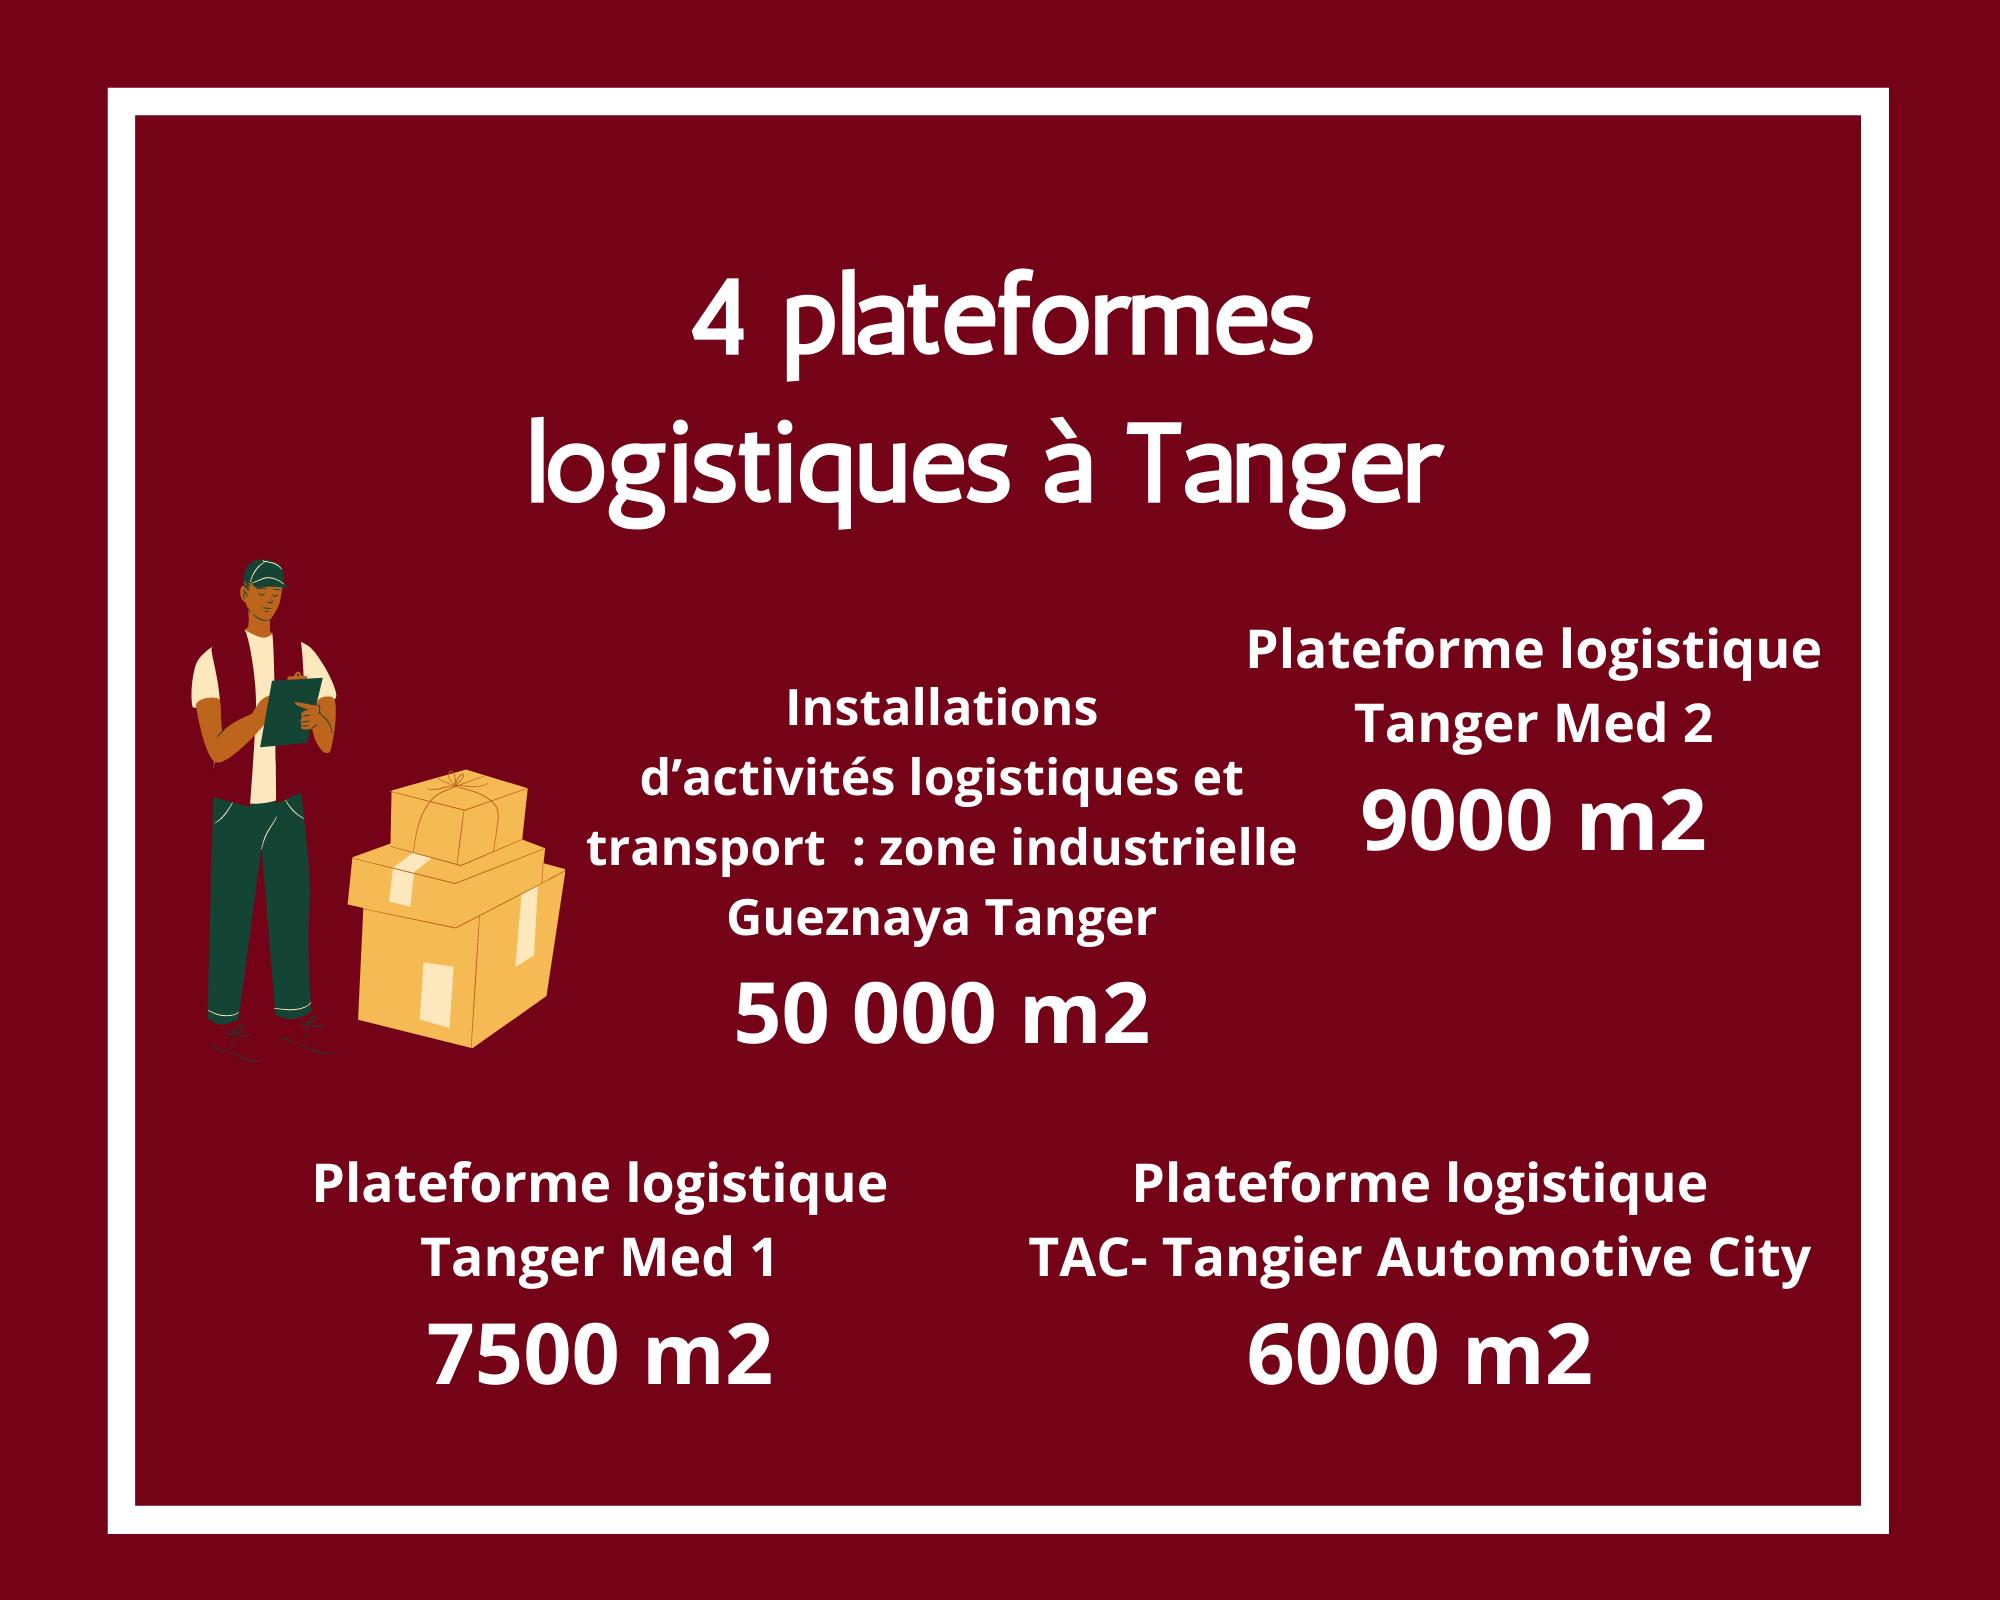 Plateforme logistique zone industrielle Gueznaya Tanger (2)